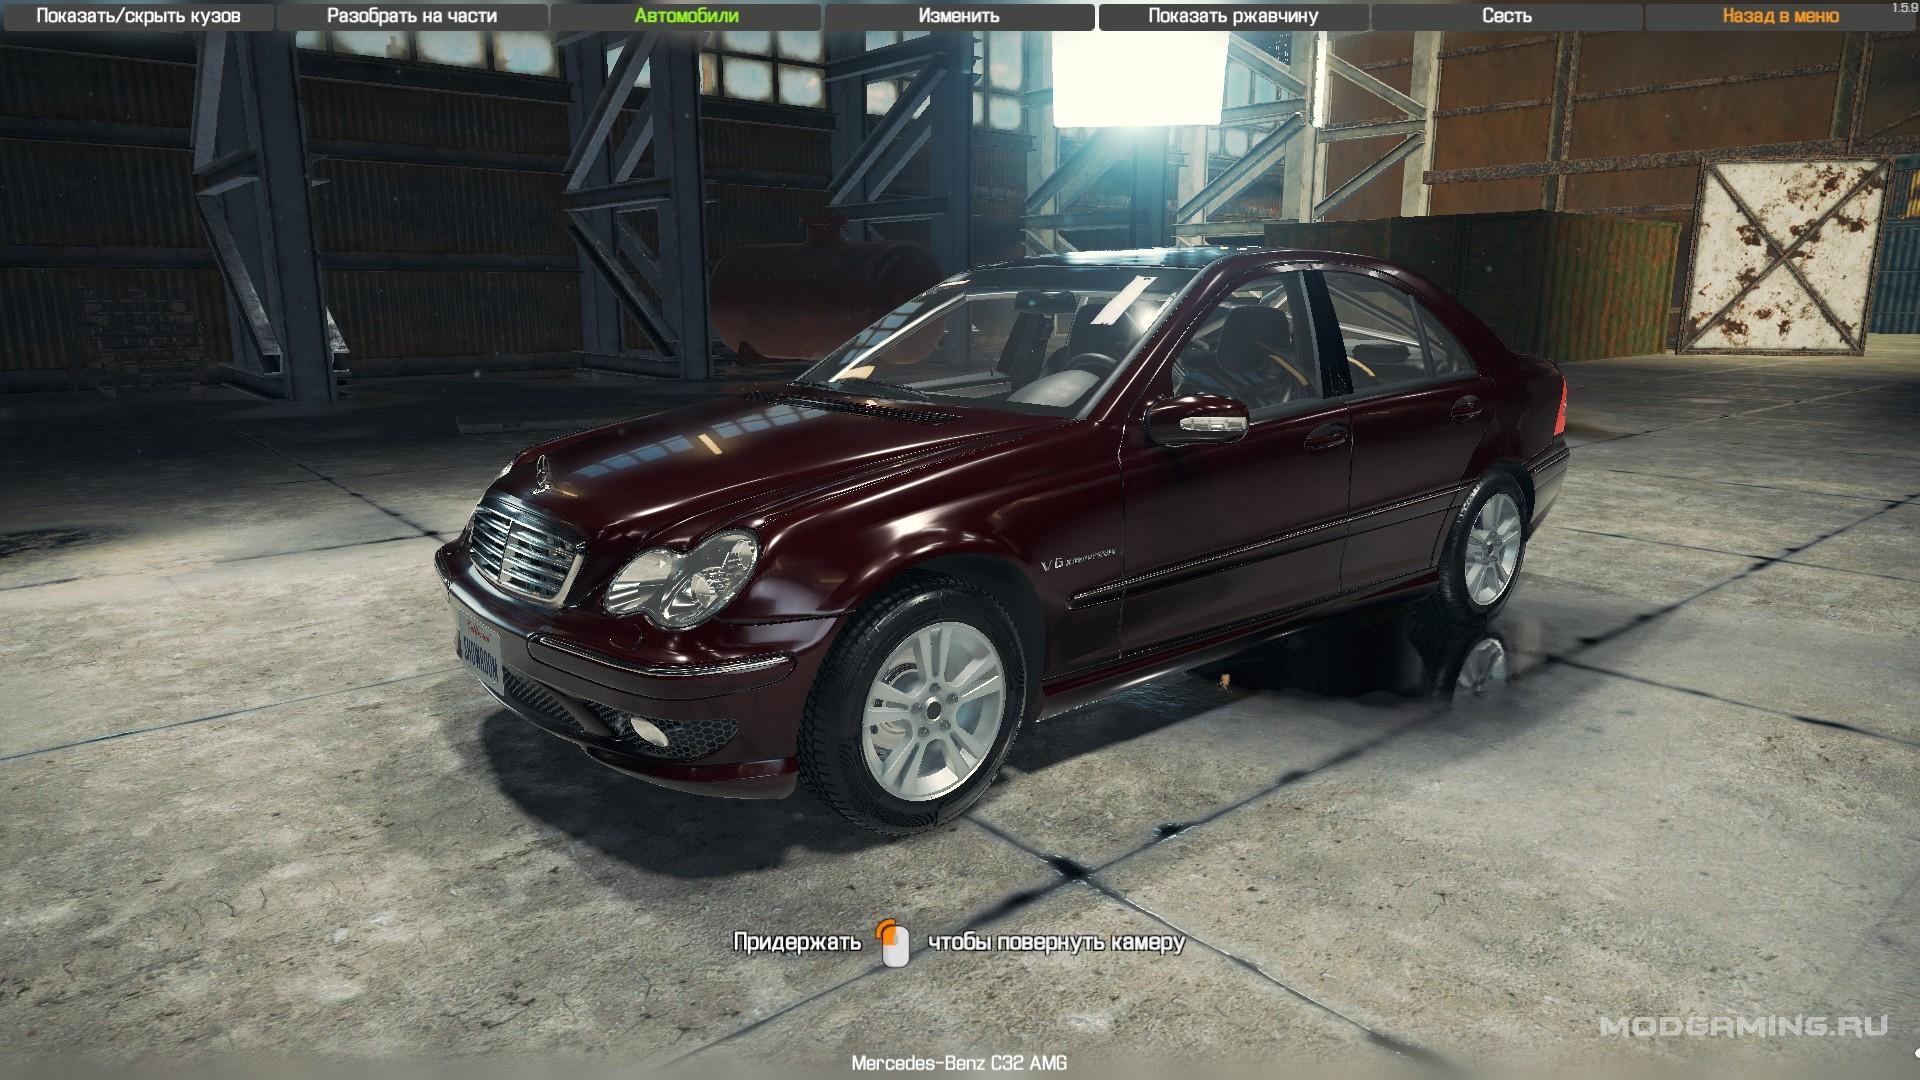 Mercedes-Benz C32 AMG